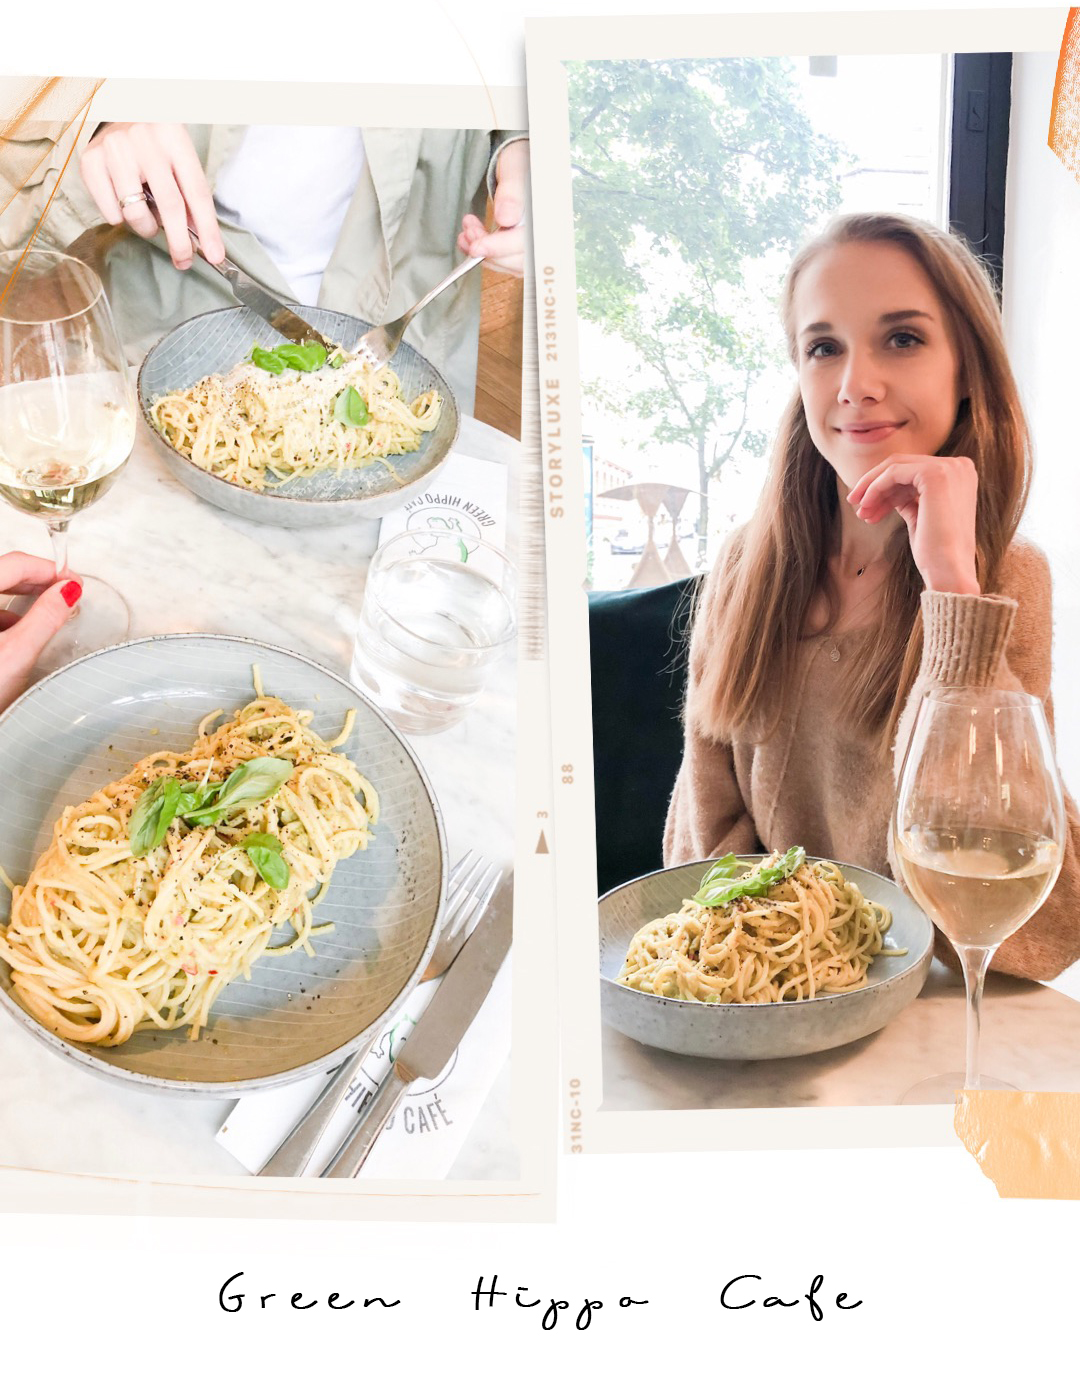 Helsinki restaurants / Ravintolat Helsinki: Green Hippo Cafe + avocado pasta